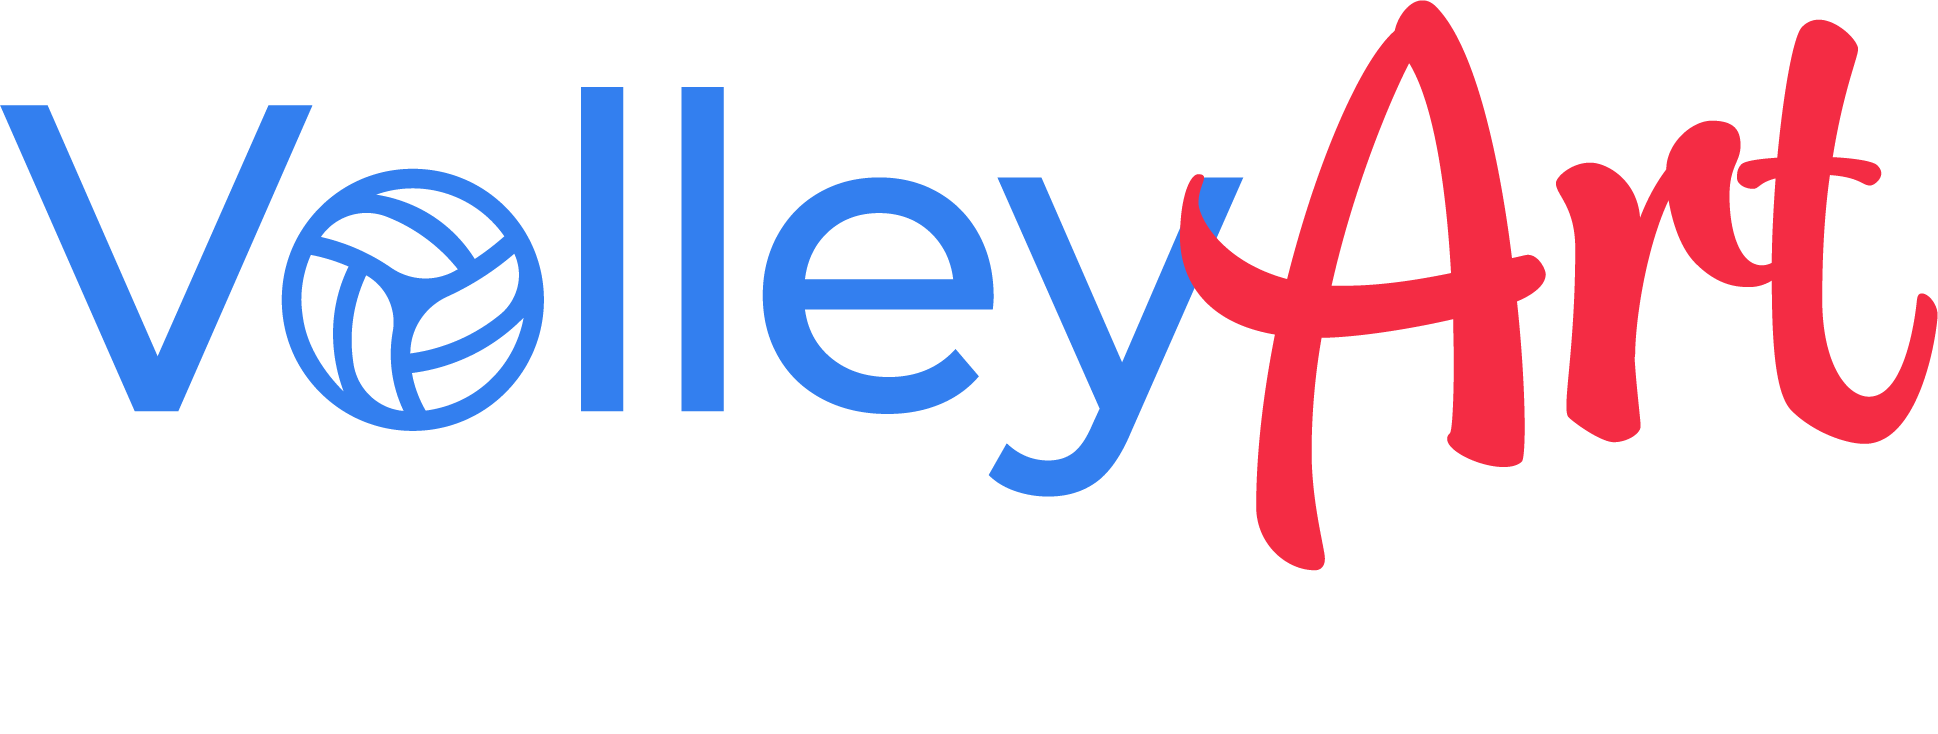 Sportclub VolleyArt